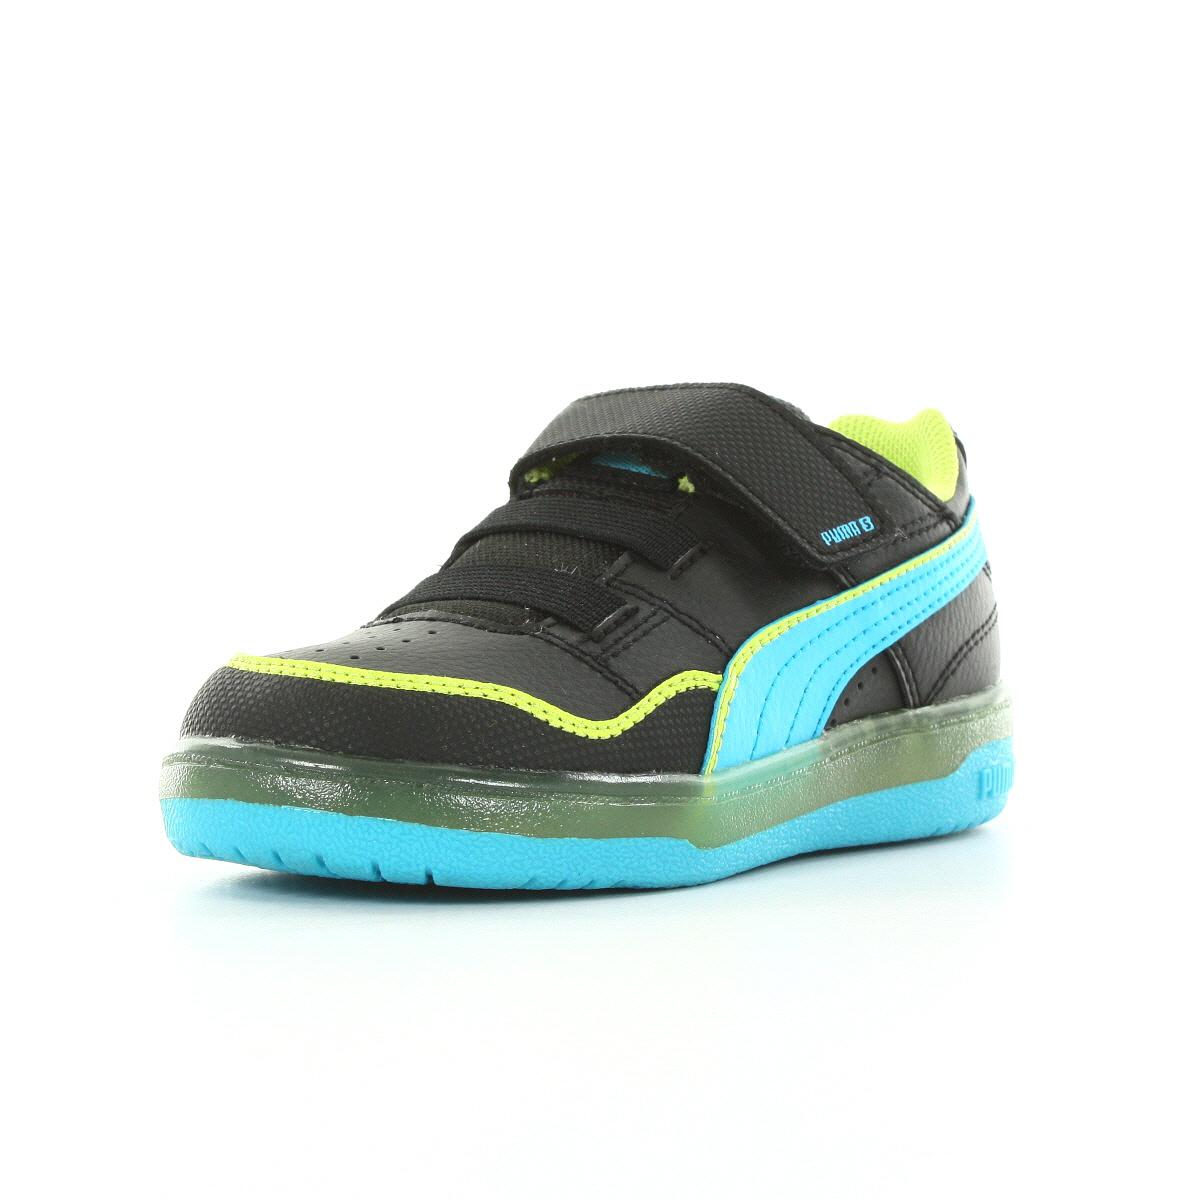 chaussures baskets puma b b grifter light up kids taille. Black Bedroom Furniture Sets. Home Design Ideas